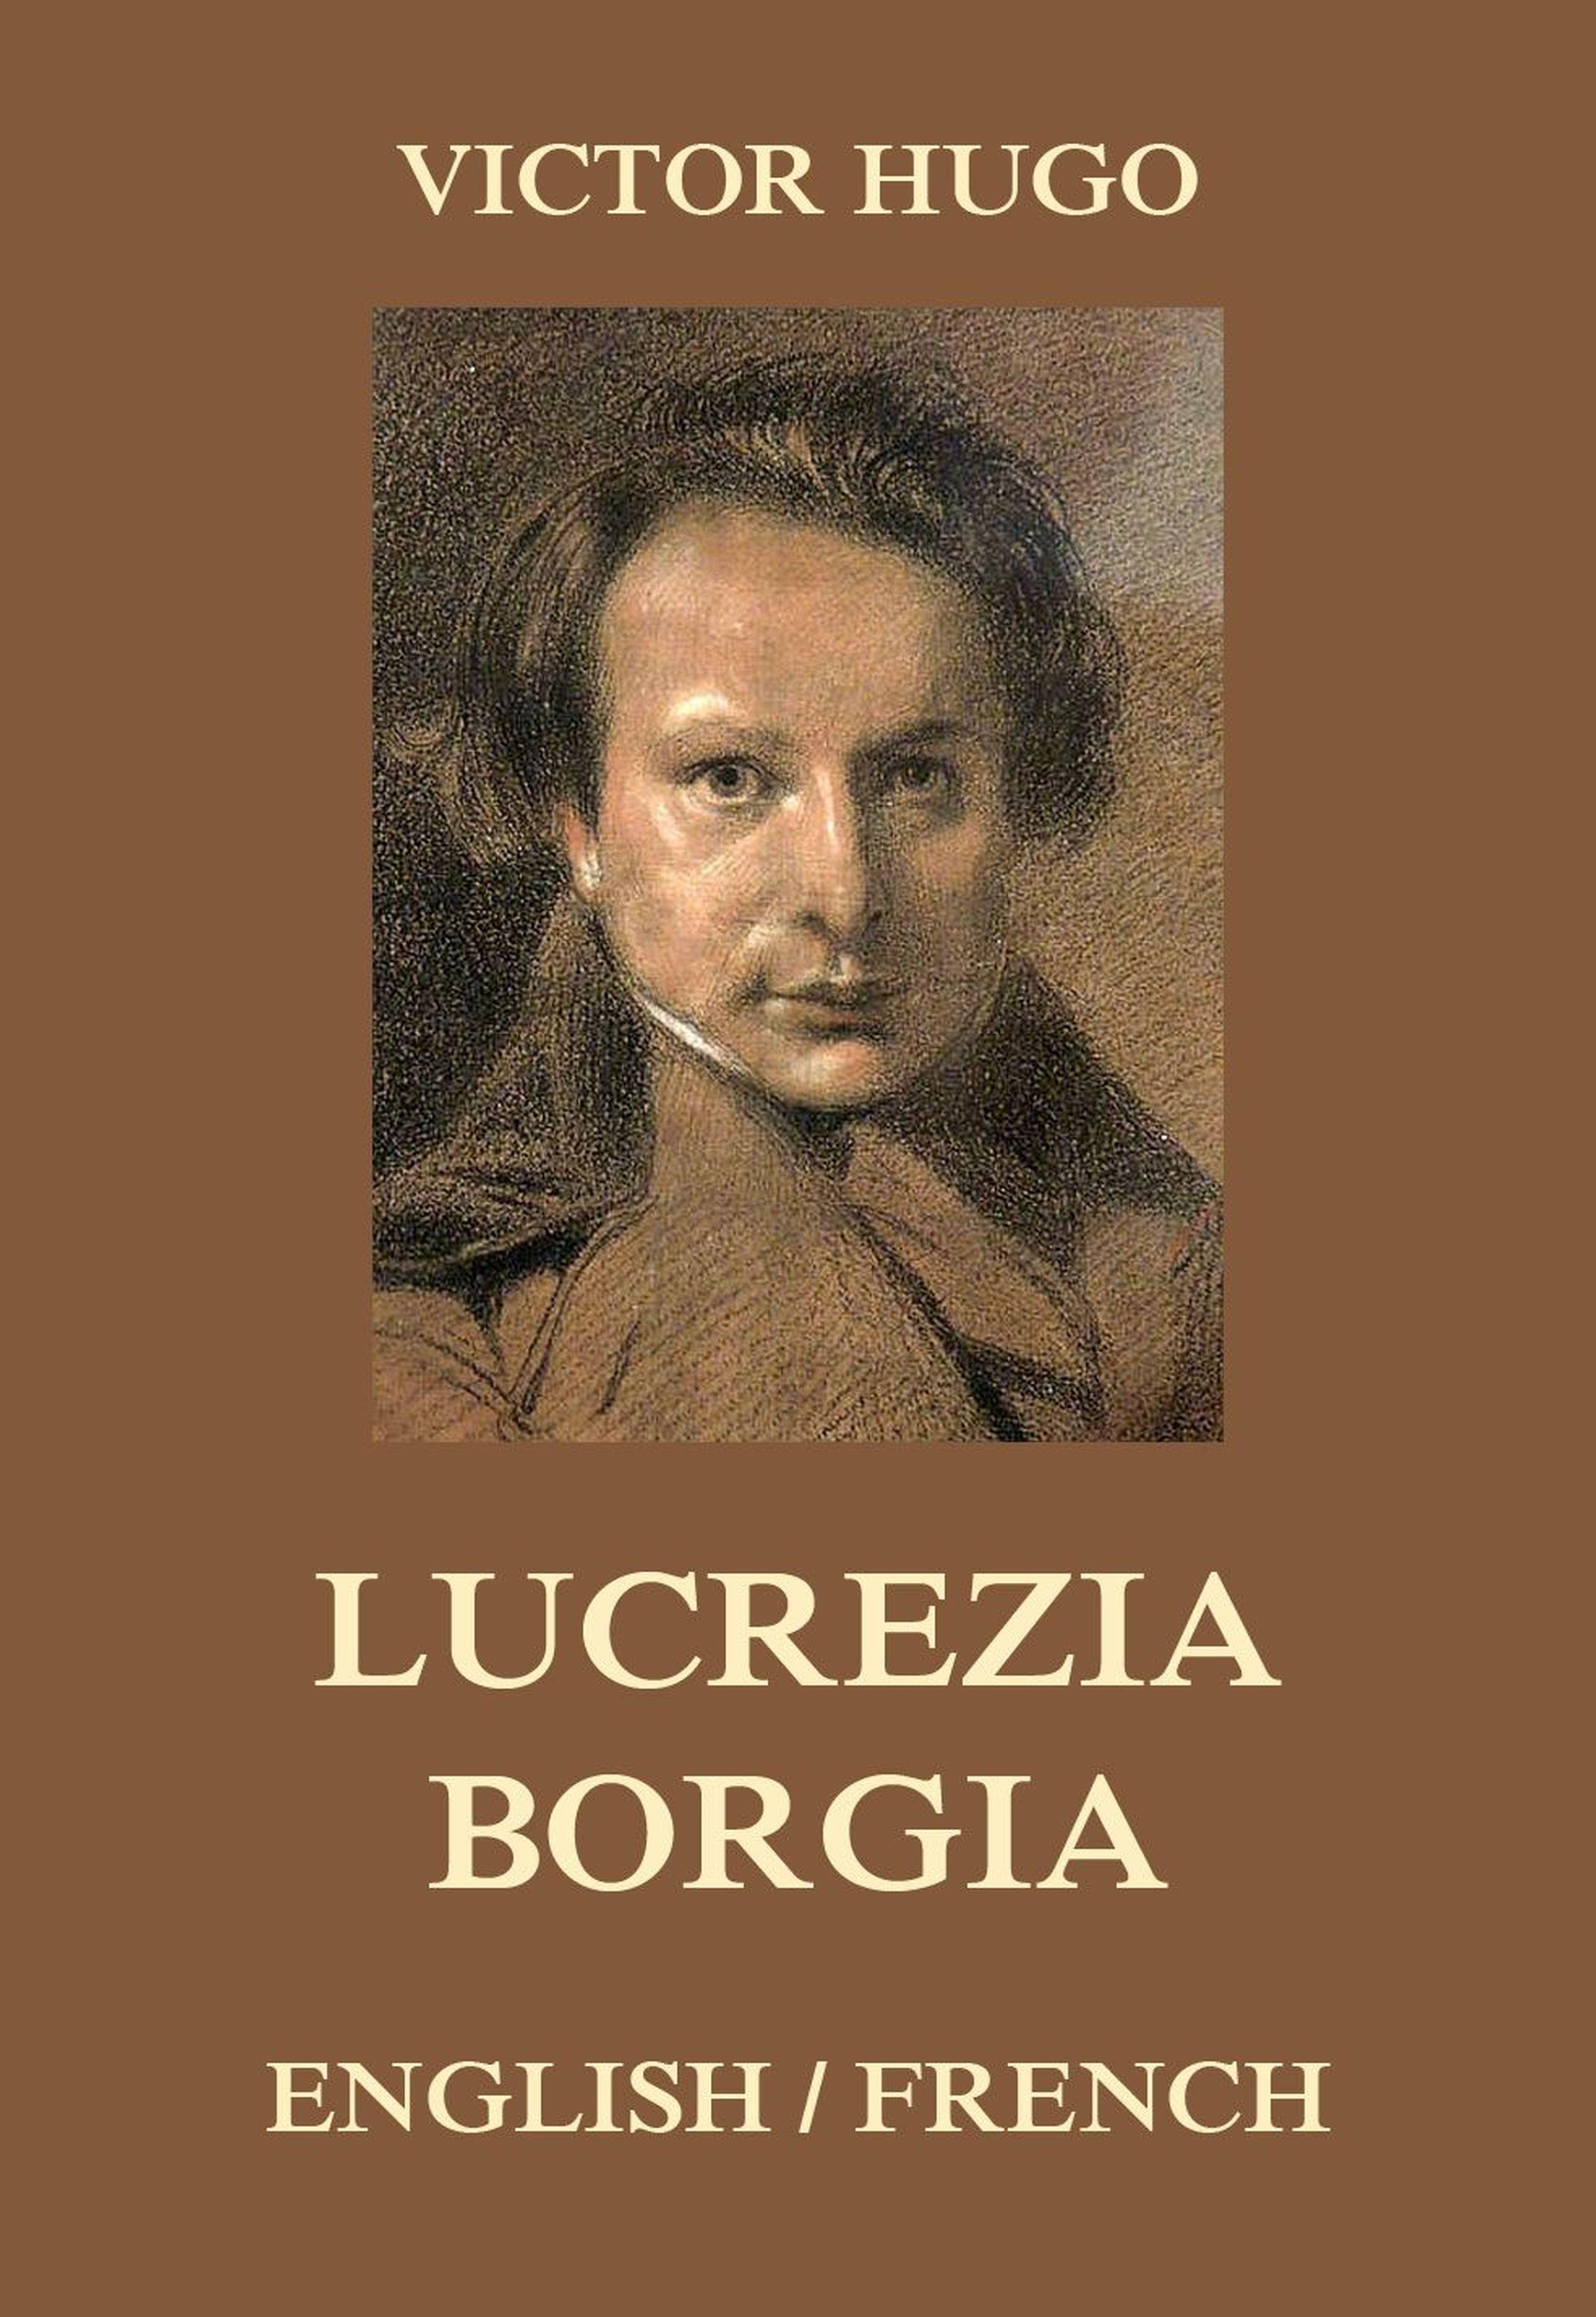 Виктор Мари Гюго Lucrezia Borgia виктор мари гюго lucrezia borgia